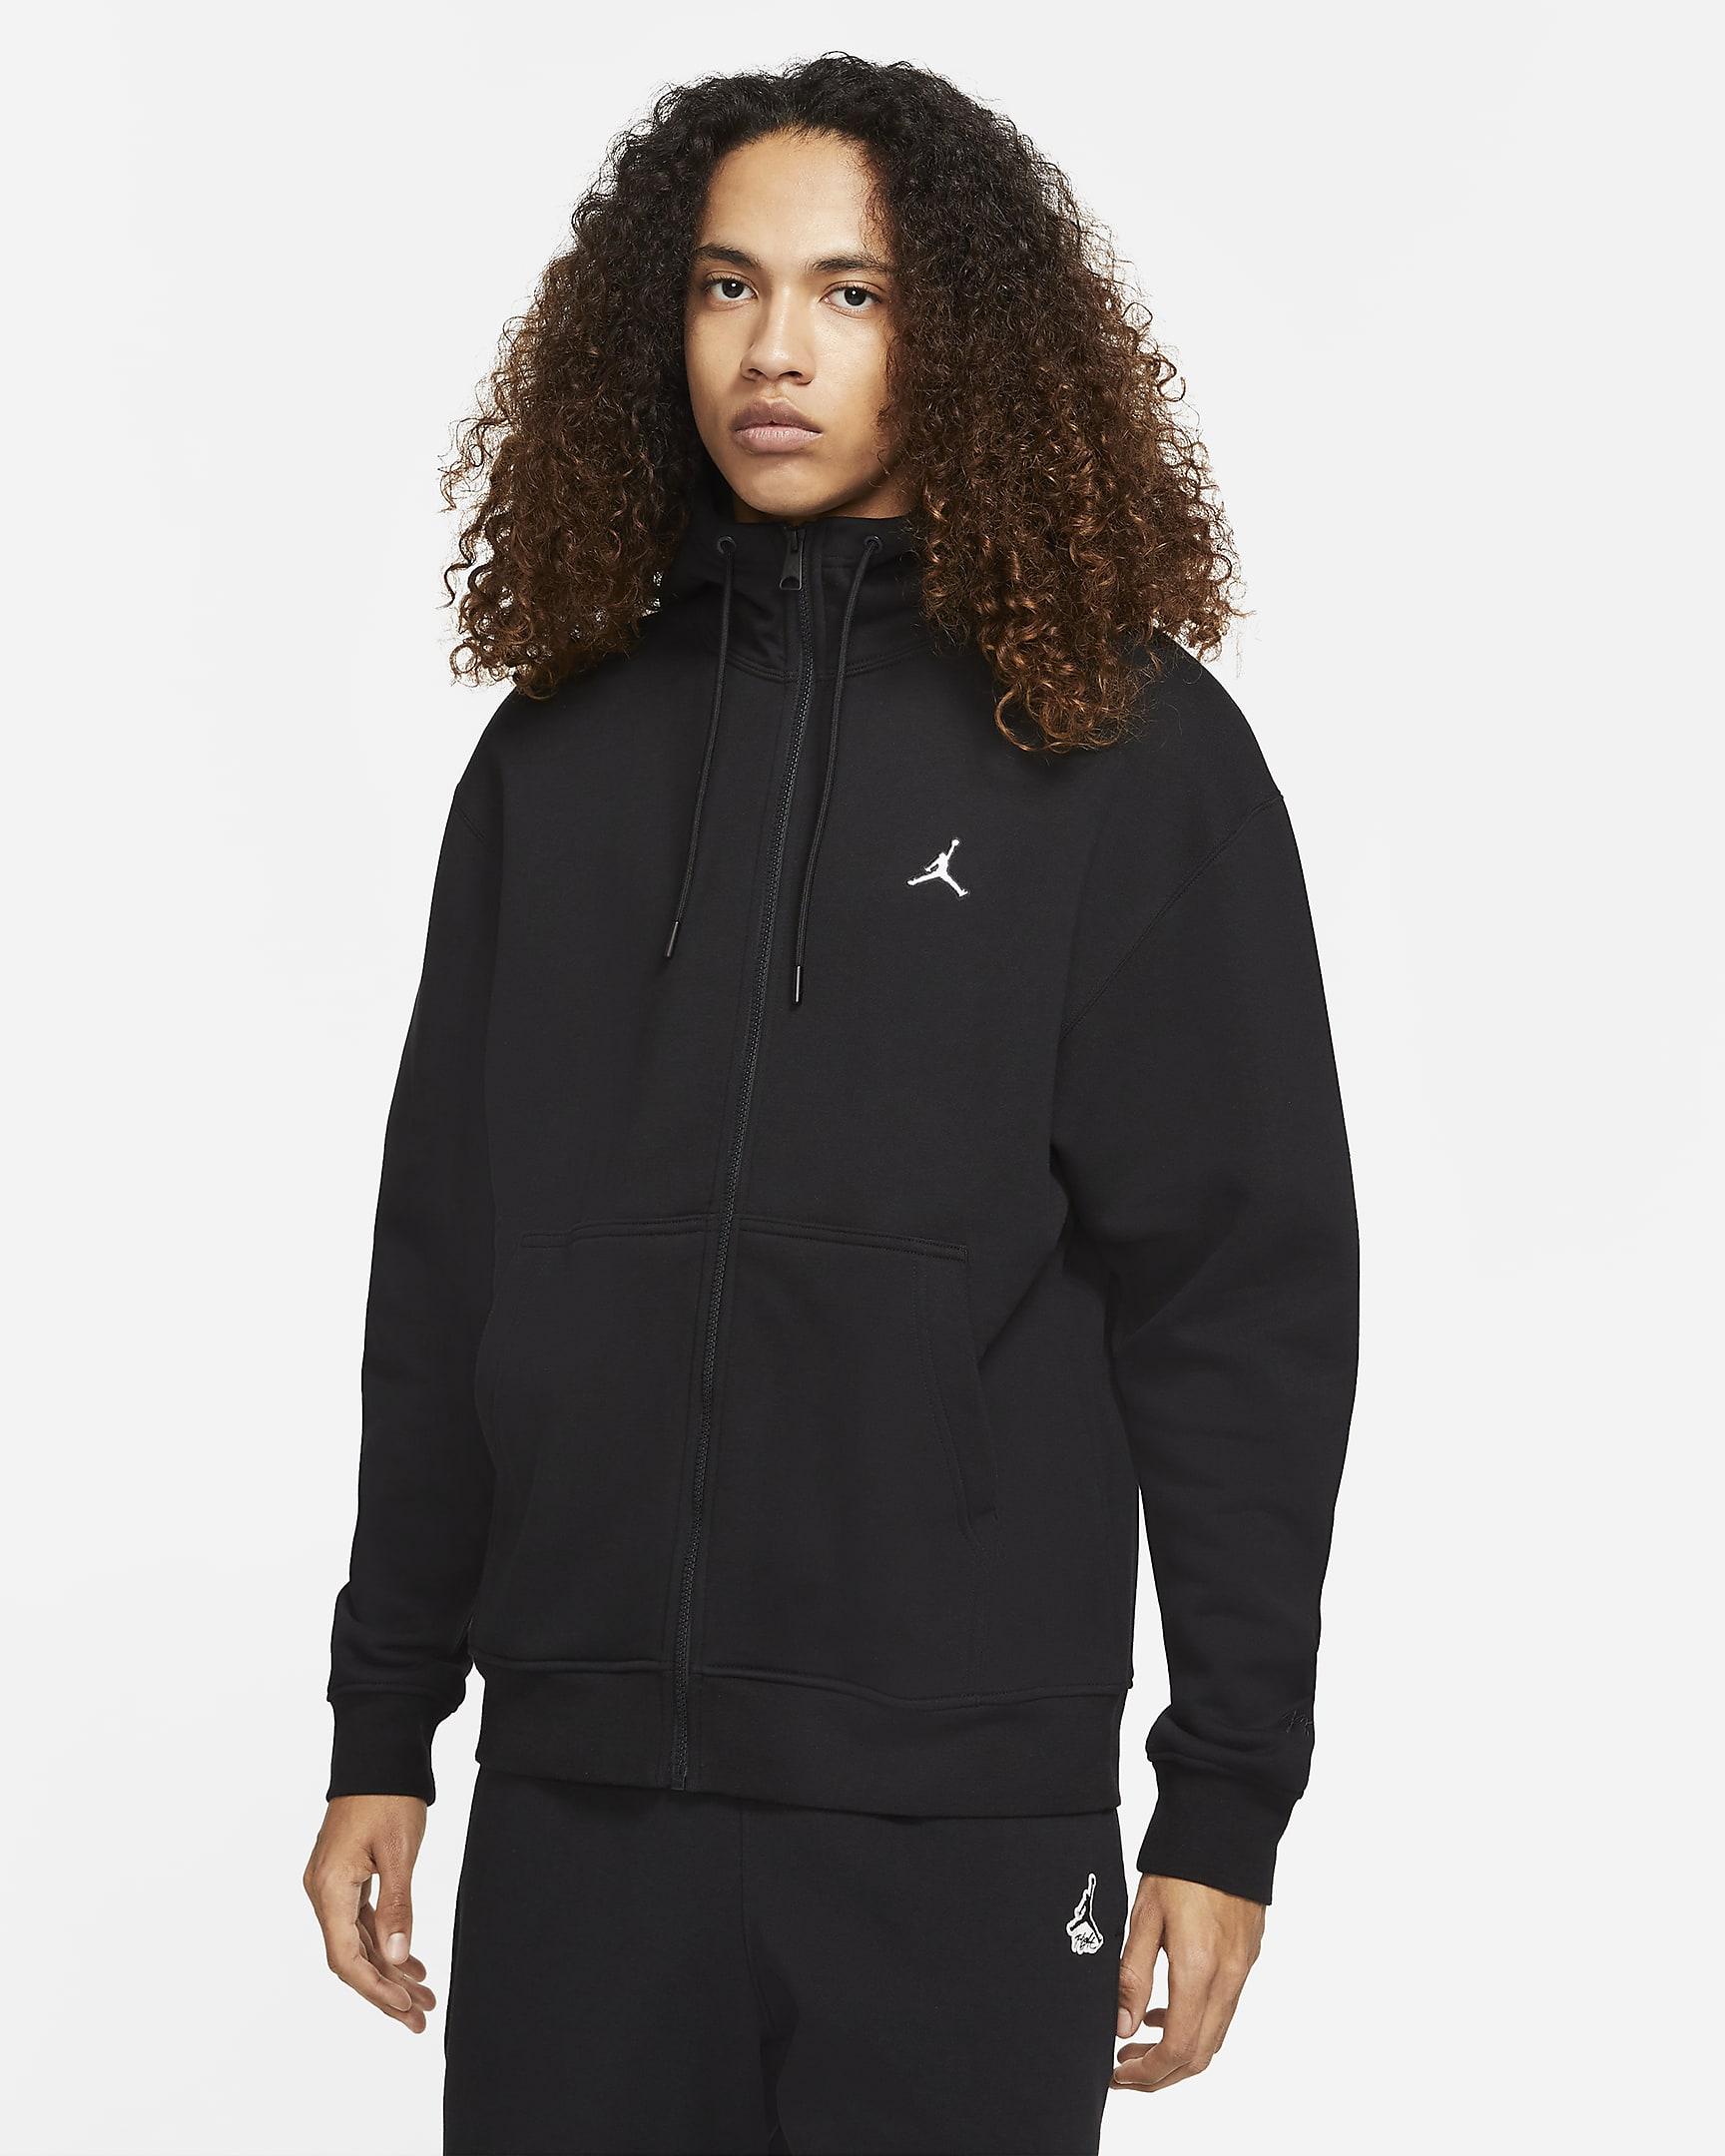 jordan-essentials-mens-fleece-full-zip-hoodie-DKJfG9.png